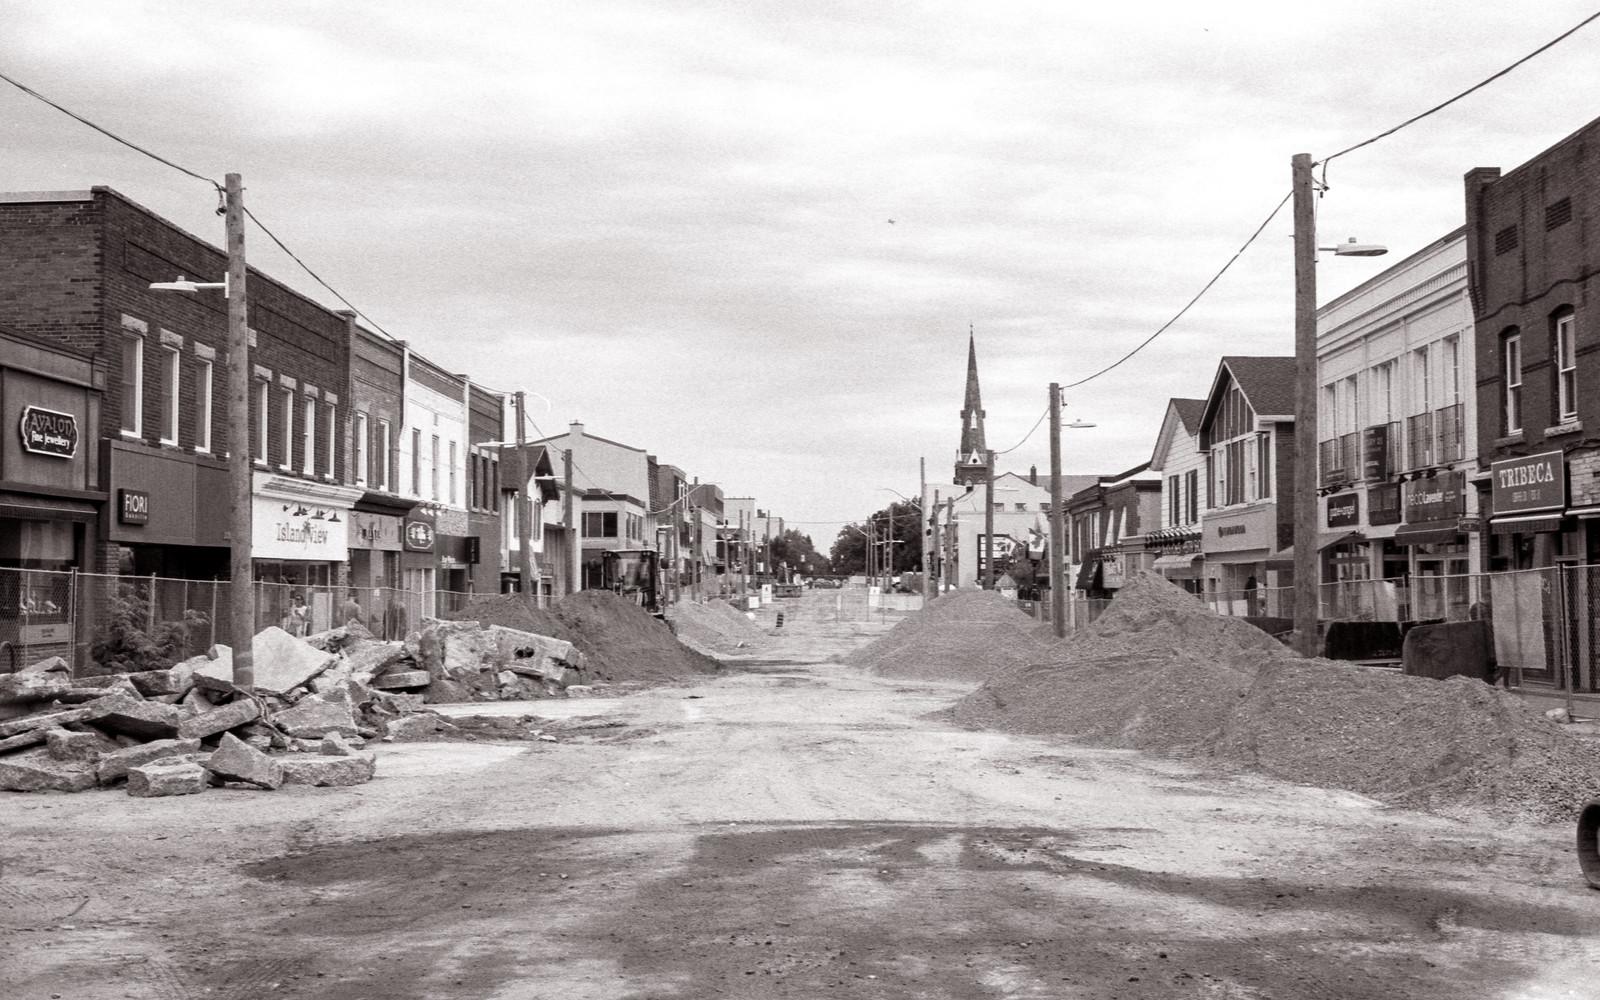 Lakeshore Road De Constructed_